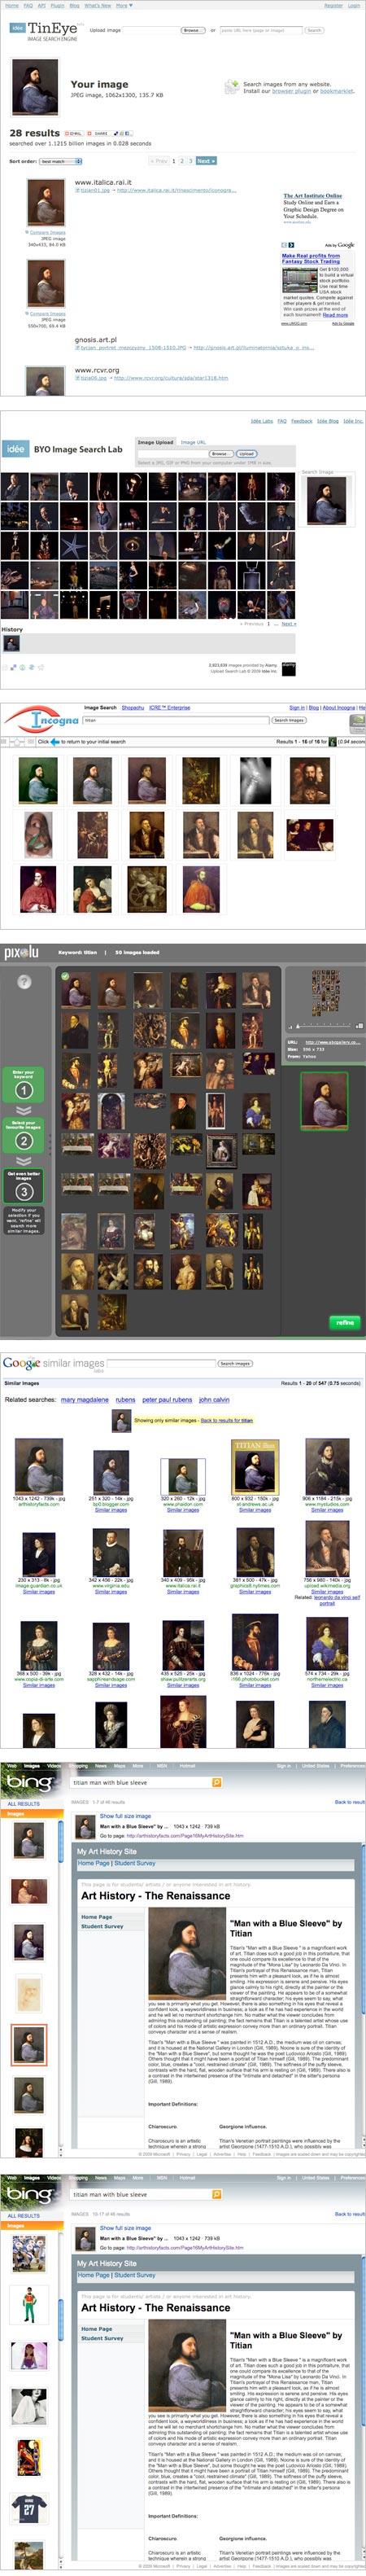 Similarity based image search, TinEye, BYO Image Search Lab, Incognia, Pixolu, Google Similar Images, Bing